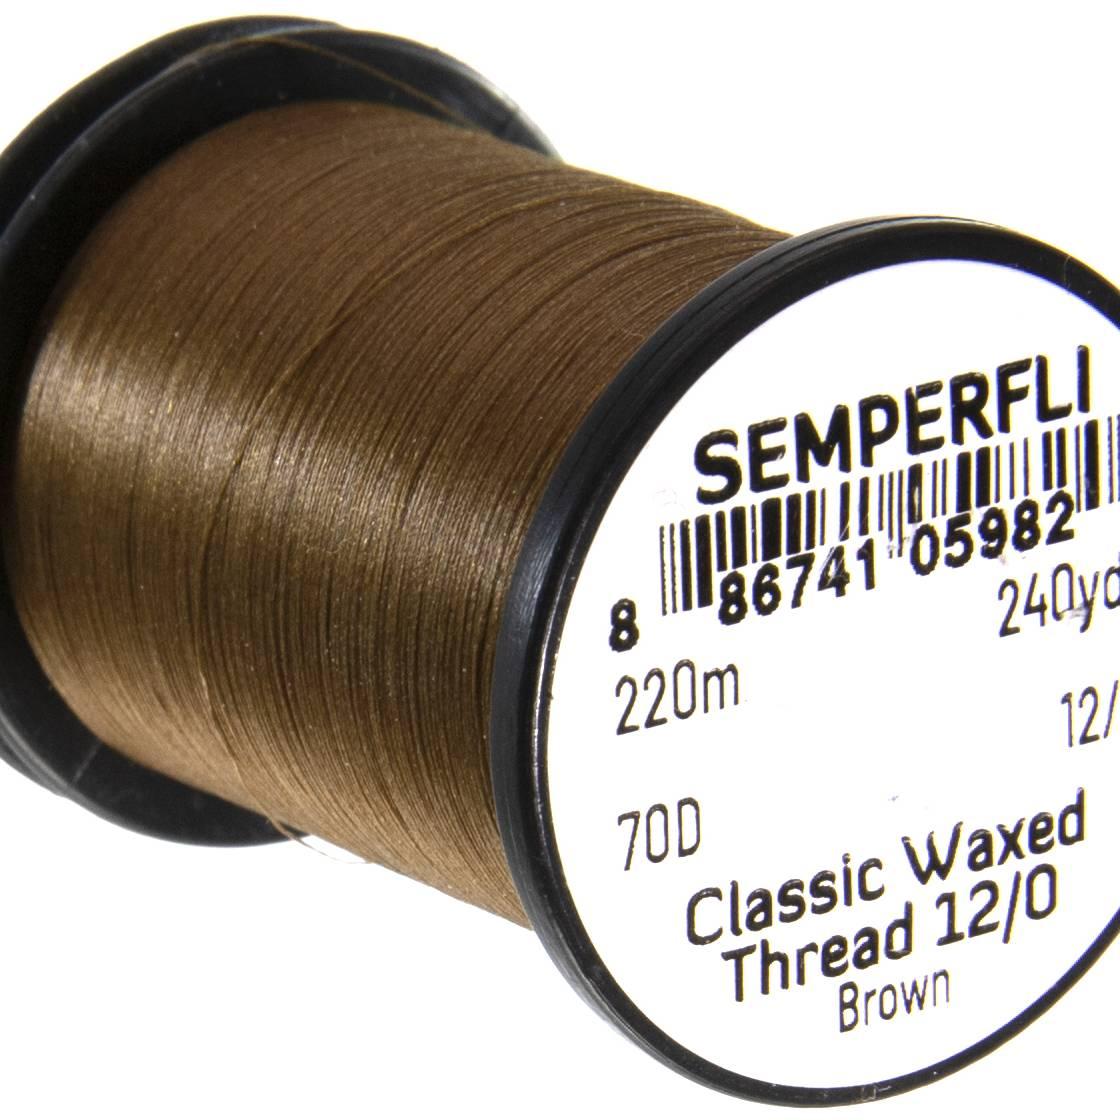 Semperfli Classic Waxed Thread 12/0 240 Yards Brown